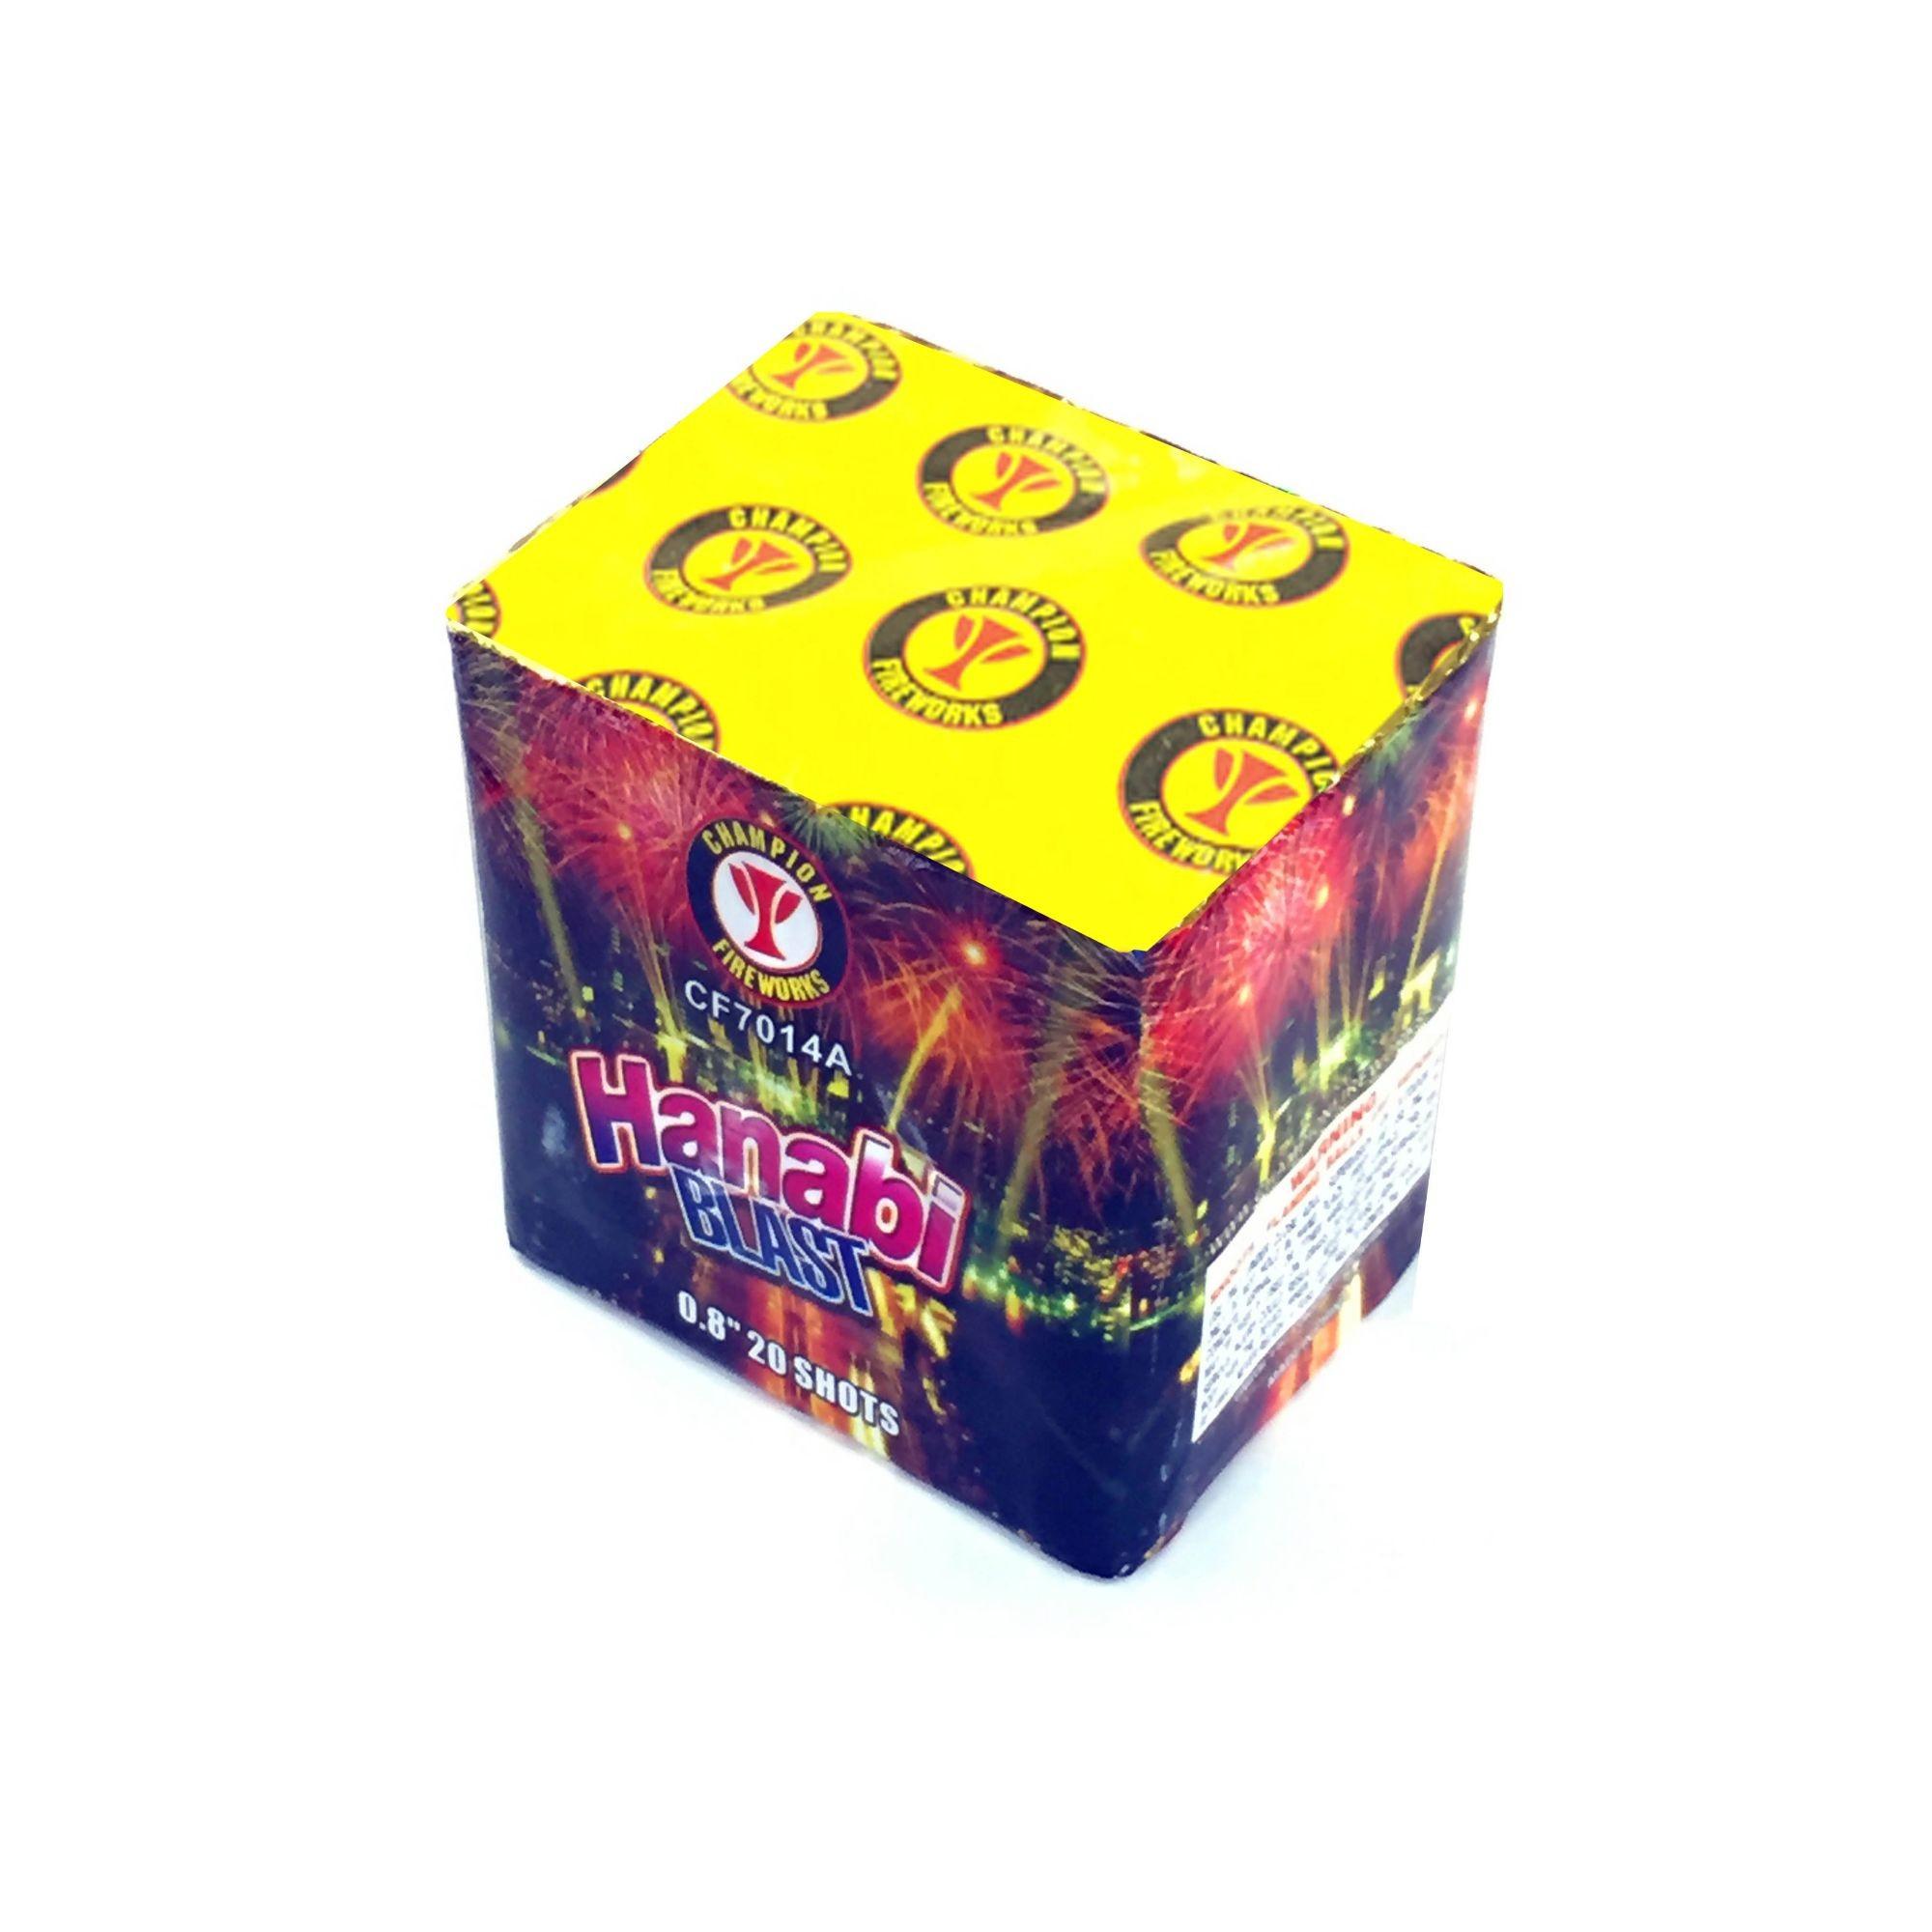 Hanabi Blast 20 Shots Cake Fireworks A